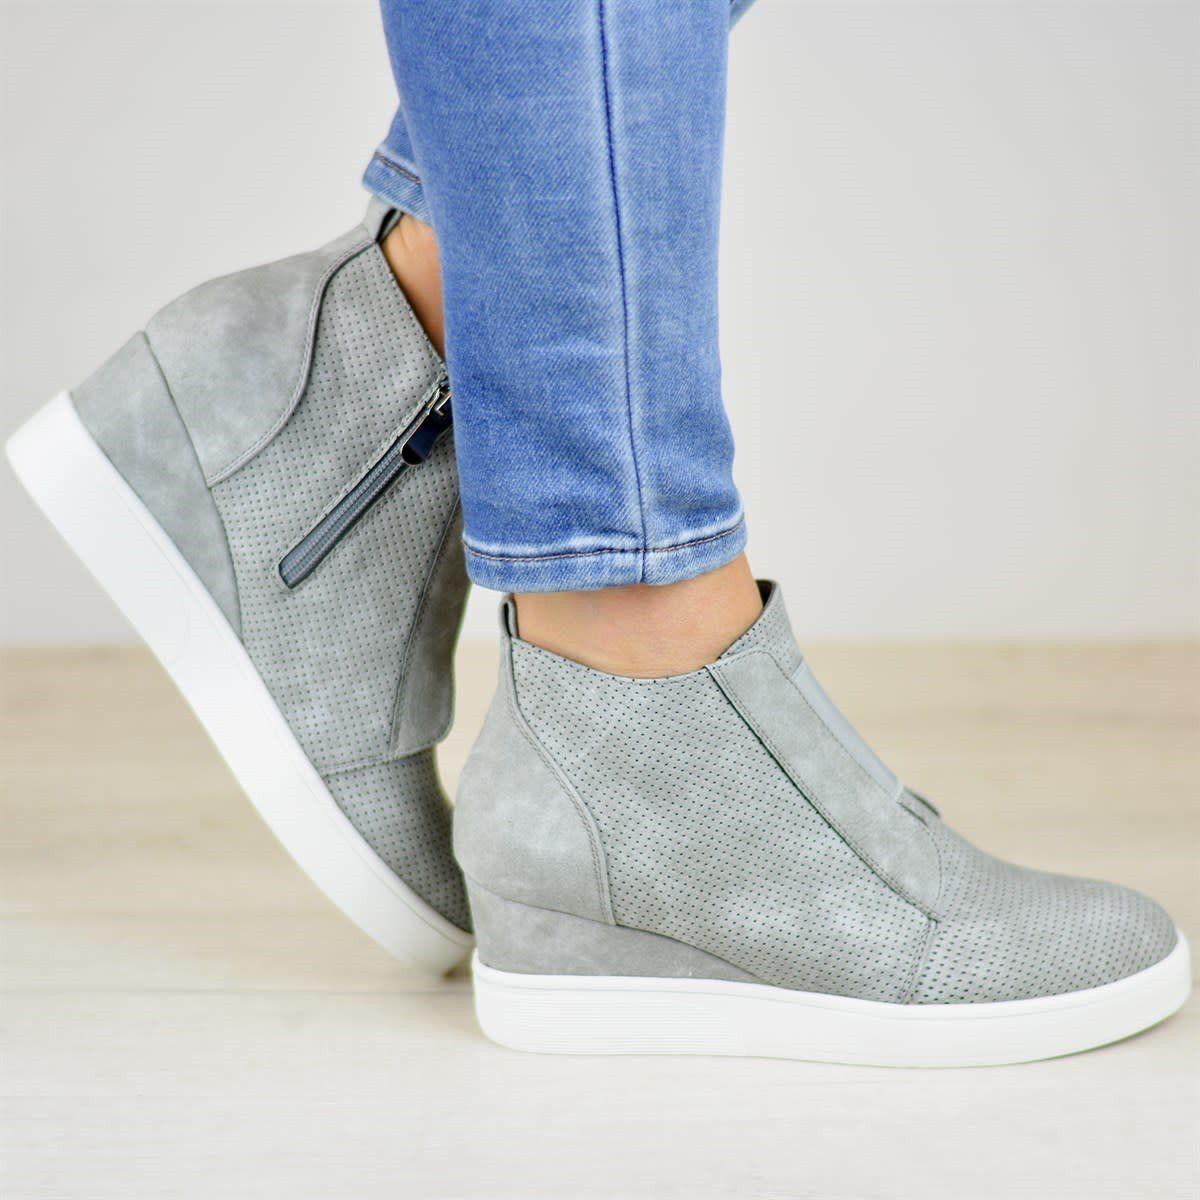 ba01e769f55e Comfort Zipper Wedge Sneakers Plus Size Wedges with Side Zipper – Mollyca